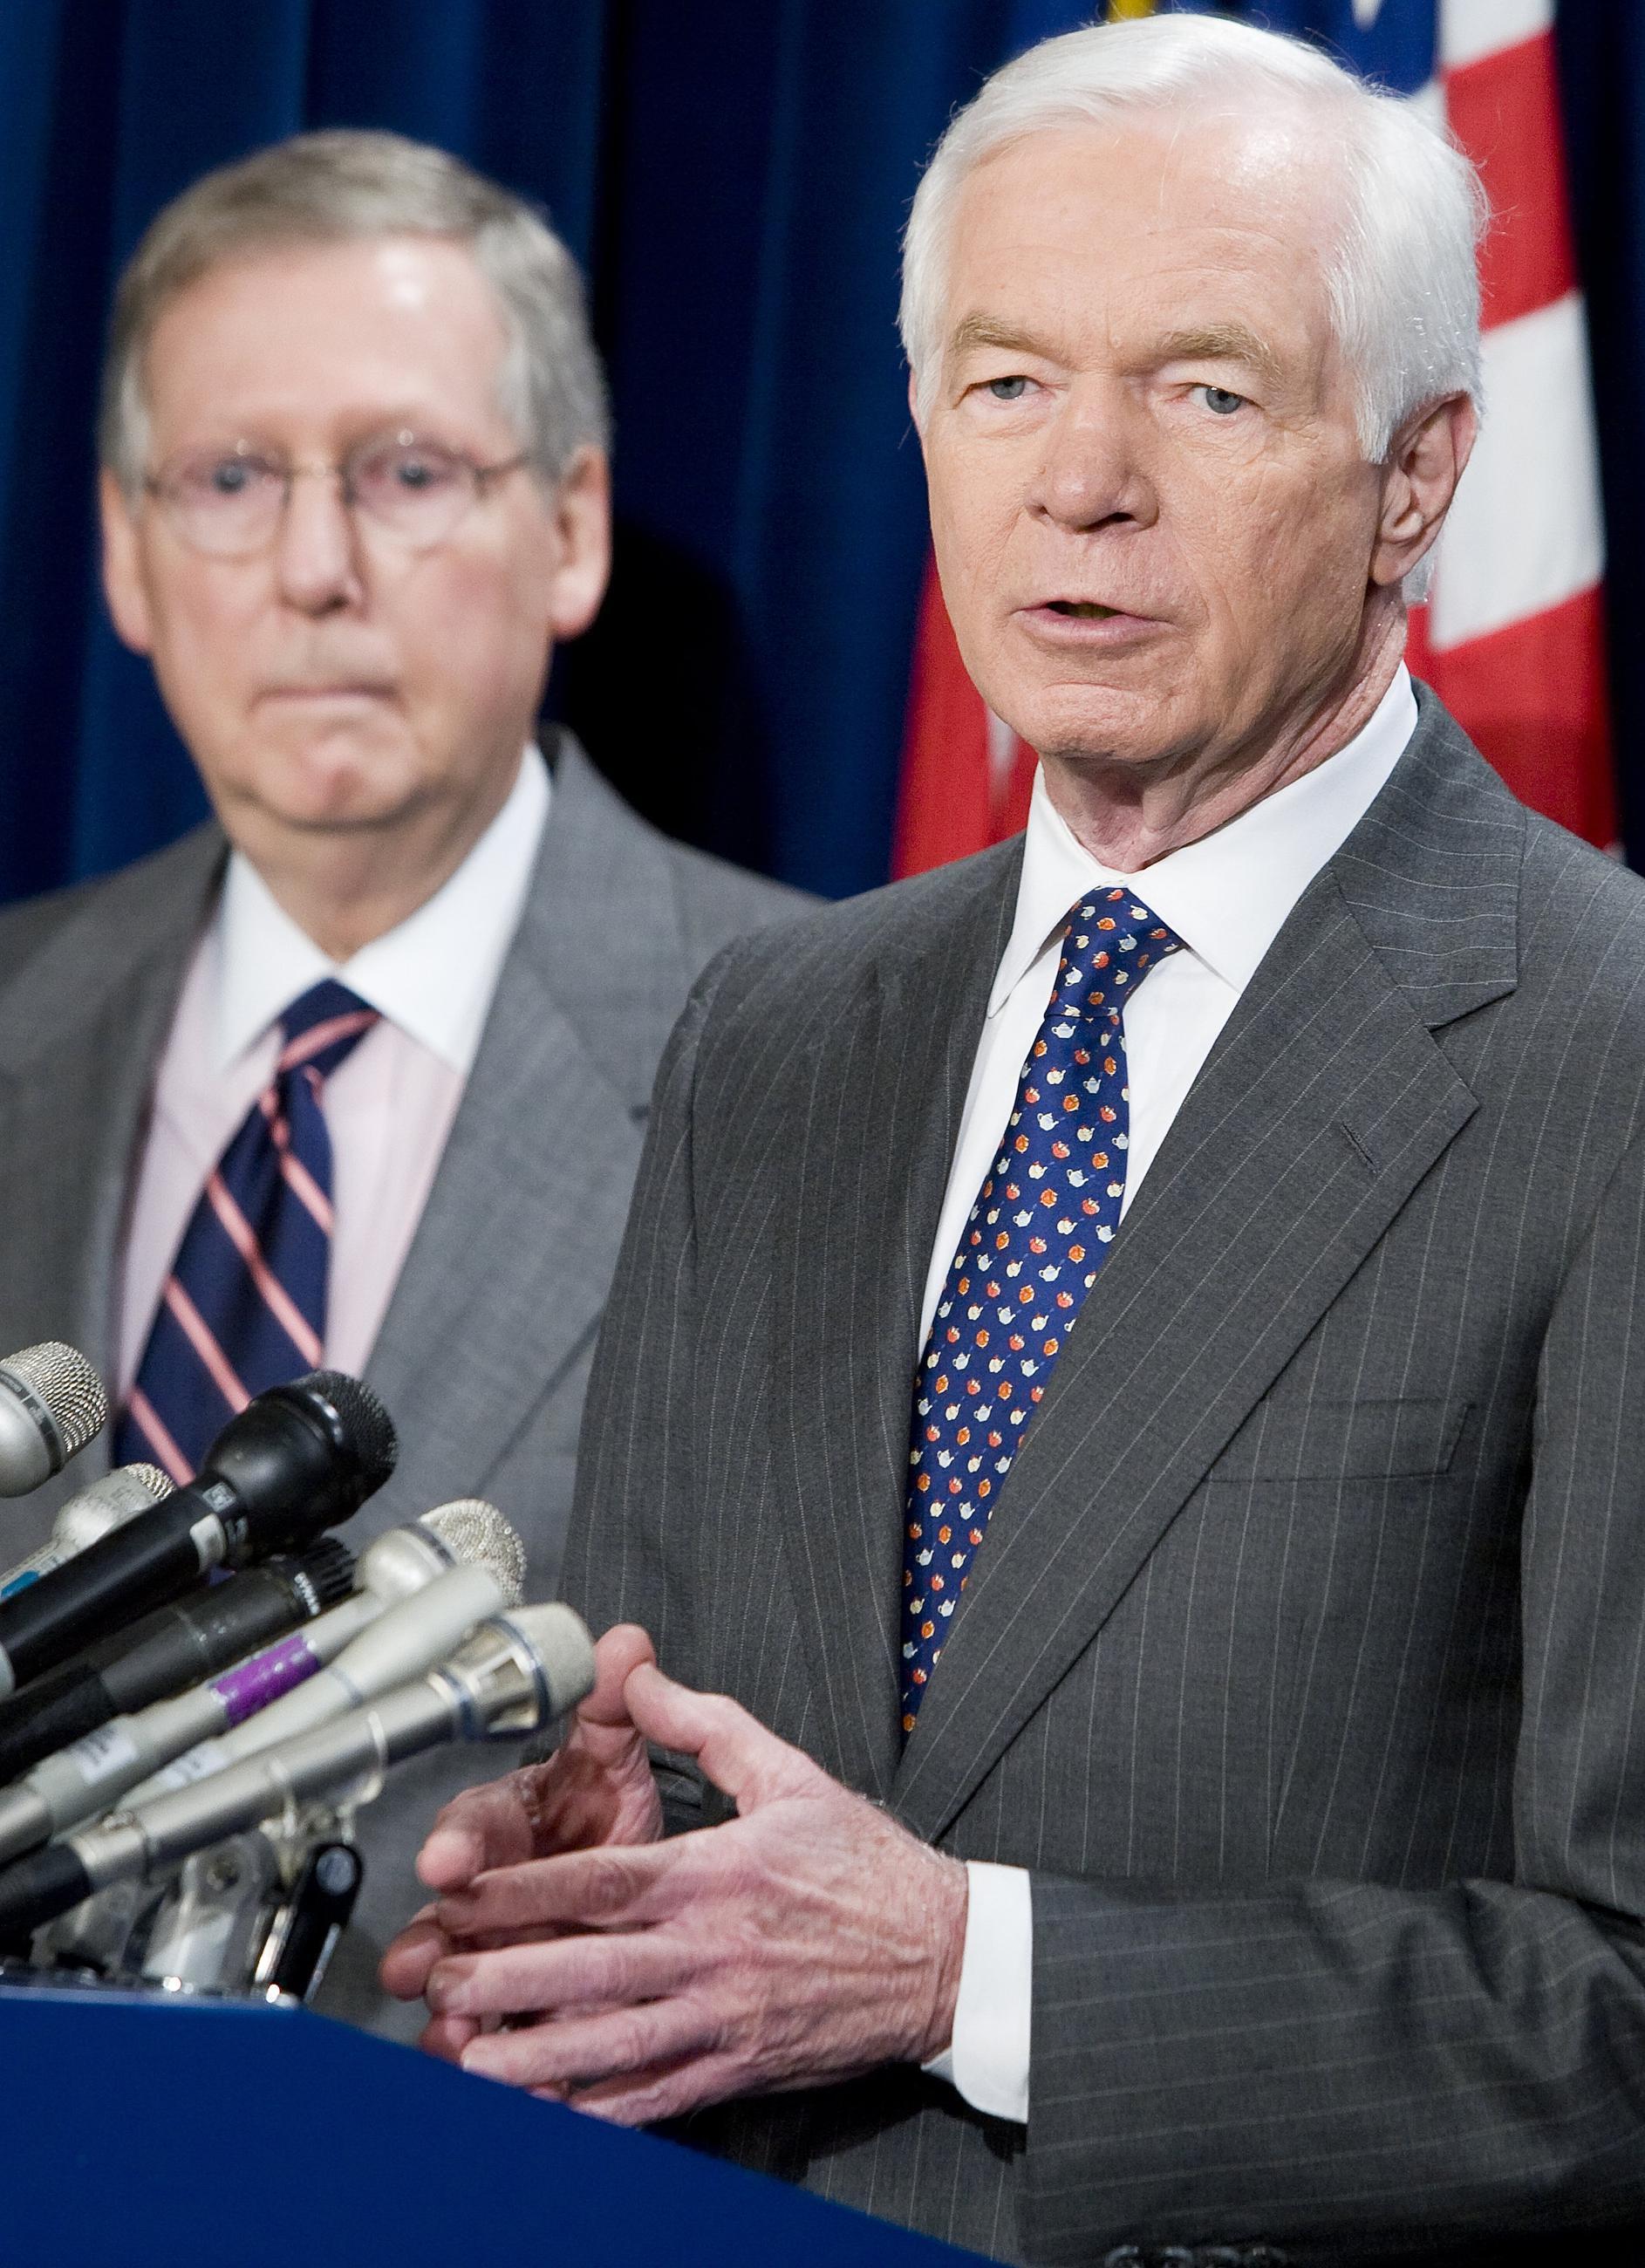 Ranking the Top 5 Senators Vulnerable in 2014 Primaries